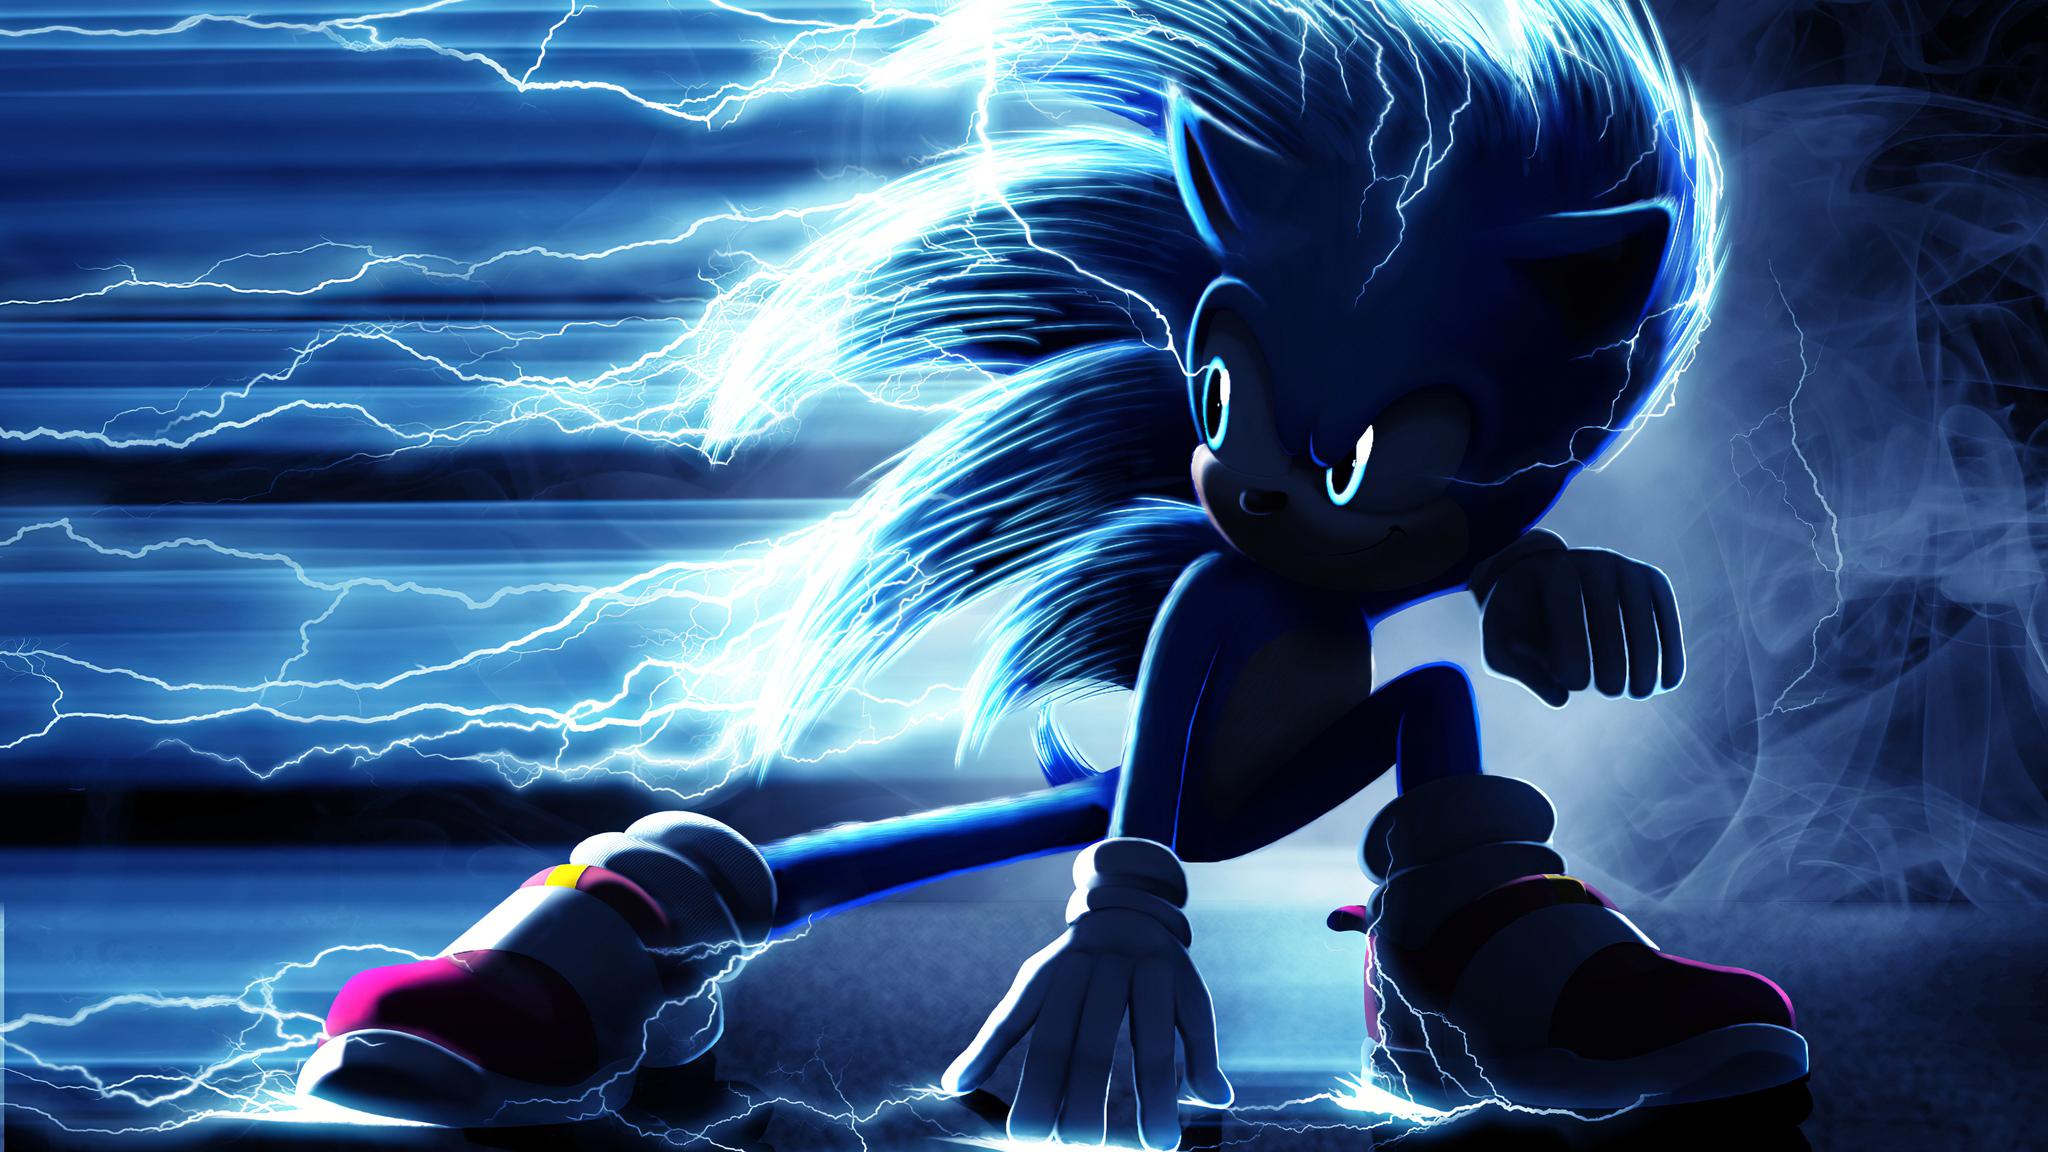 2048x1152 Sonic The Hedge Hog Movie 4k 2048x1152 ...